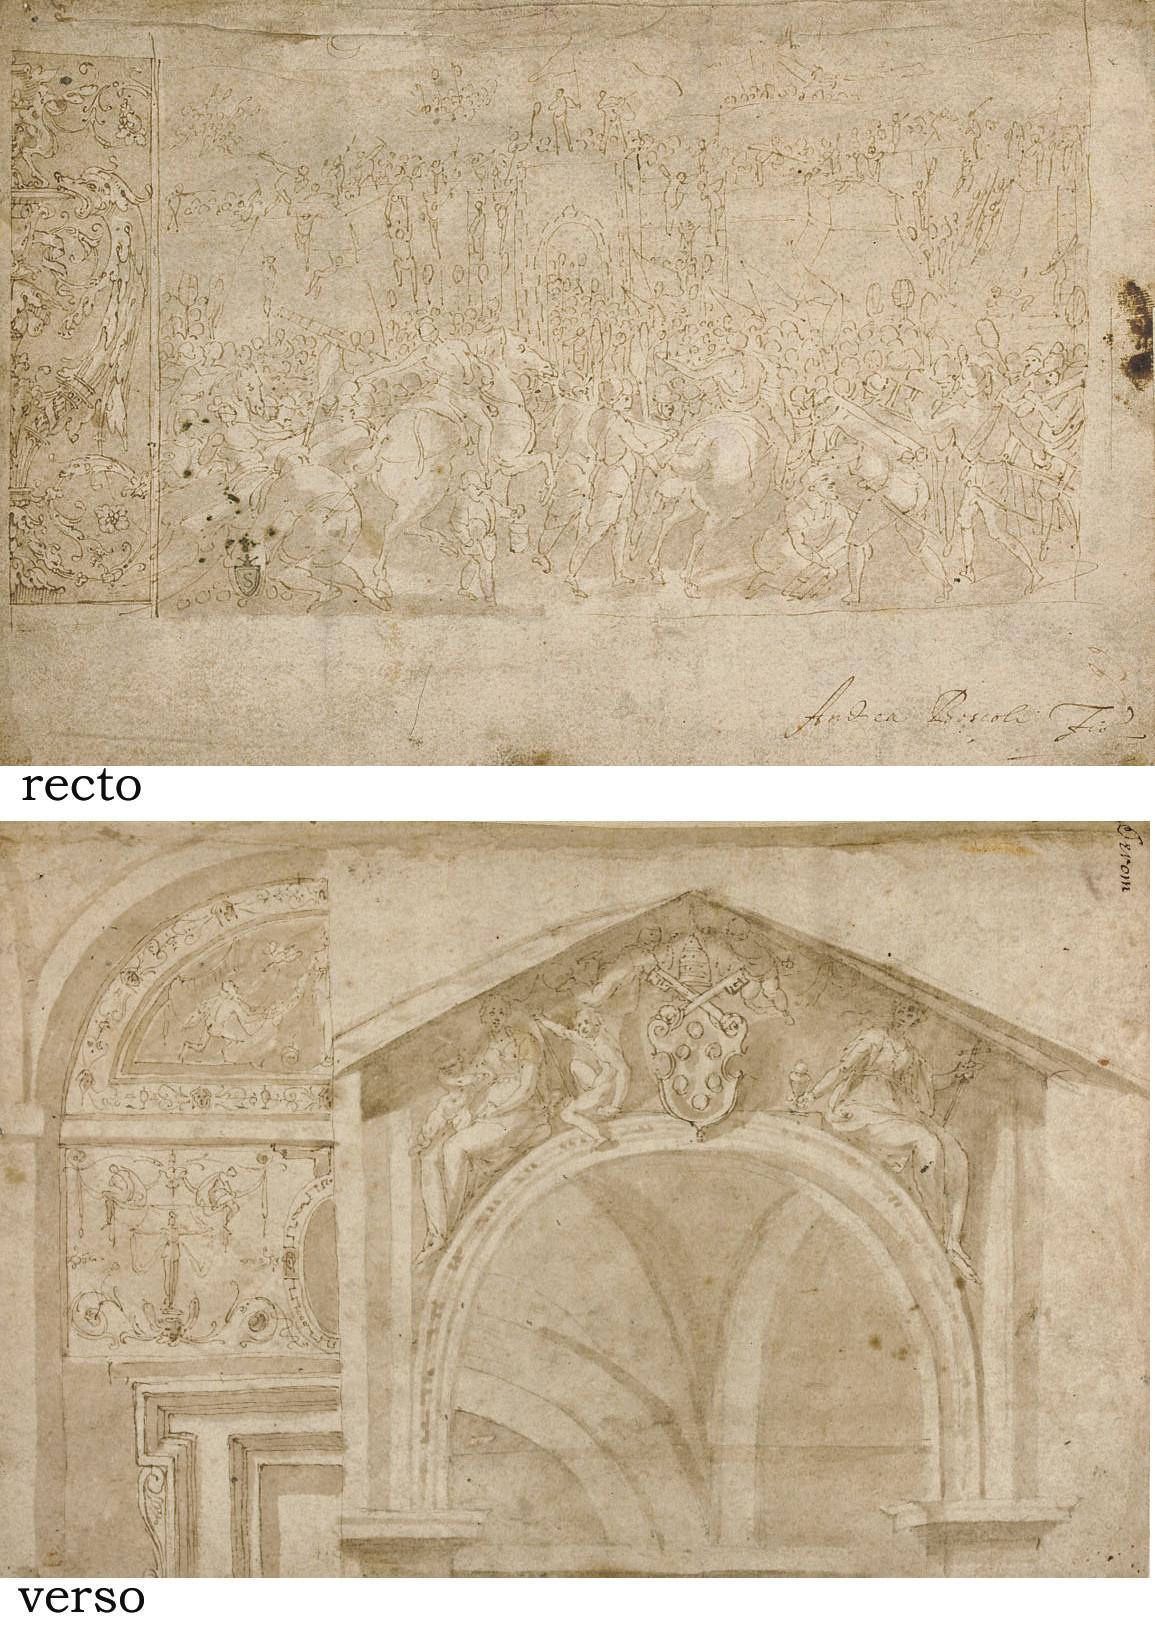 Andrea Boscoli (Florence 1560-